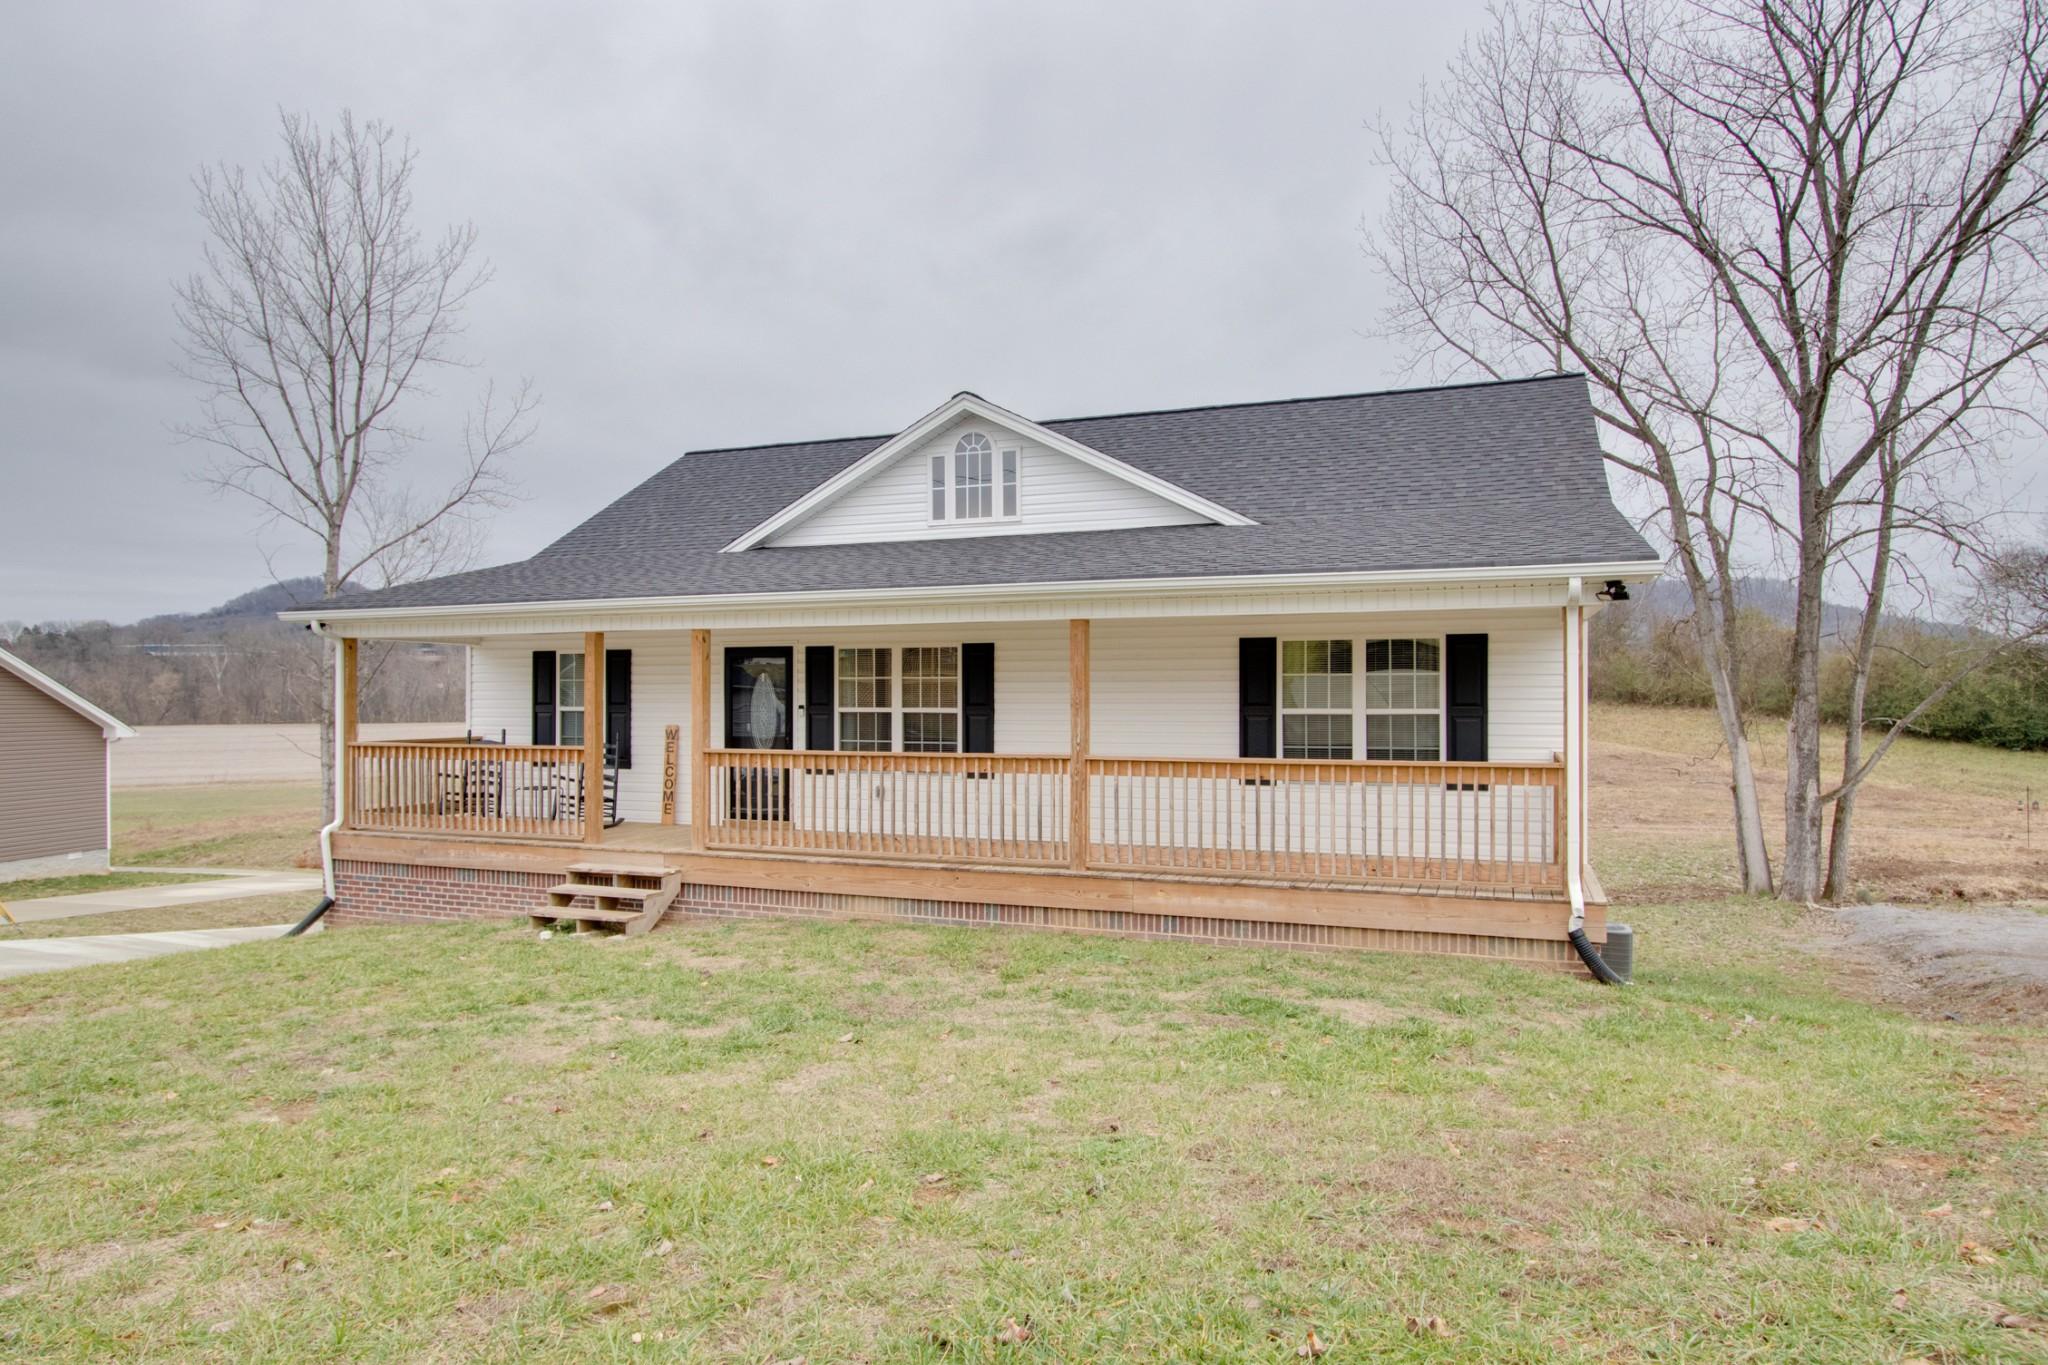 126 Rivercrest Cir, Carthage, TN 37030 - Carthage, TN real estate listing